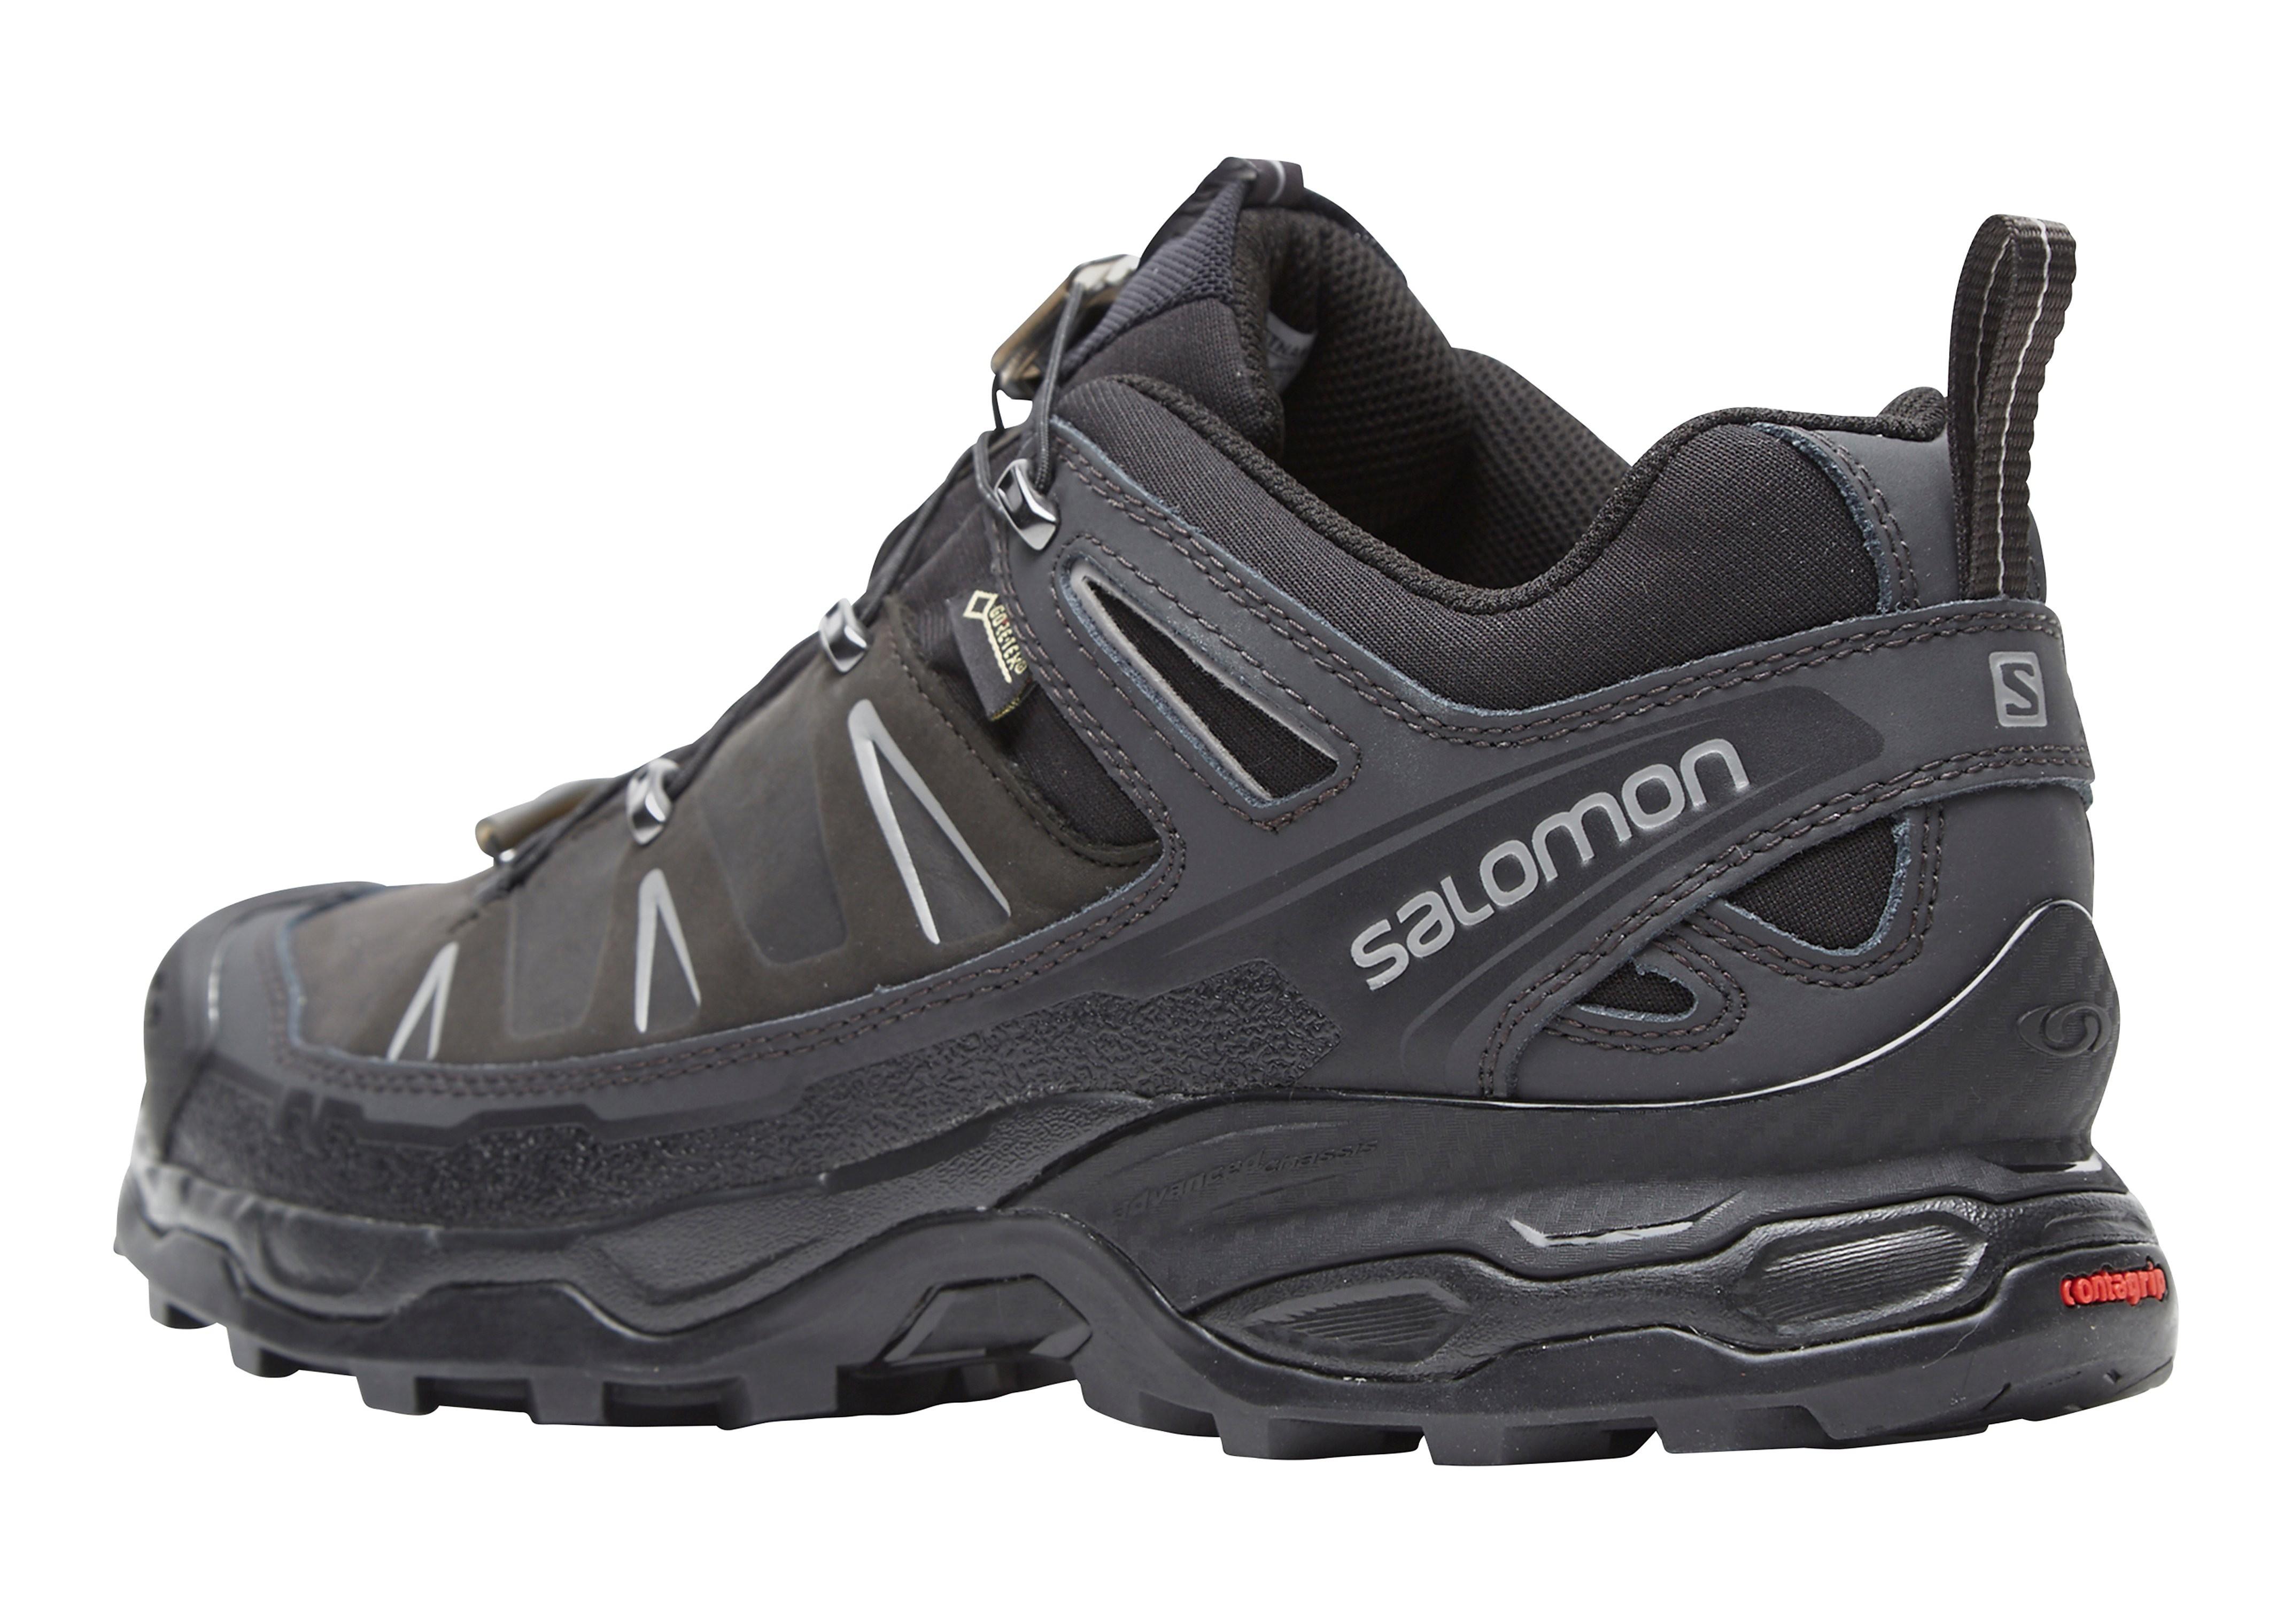 Salomon Salomon X Ultra LTR GTX Hiking Shoes